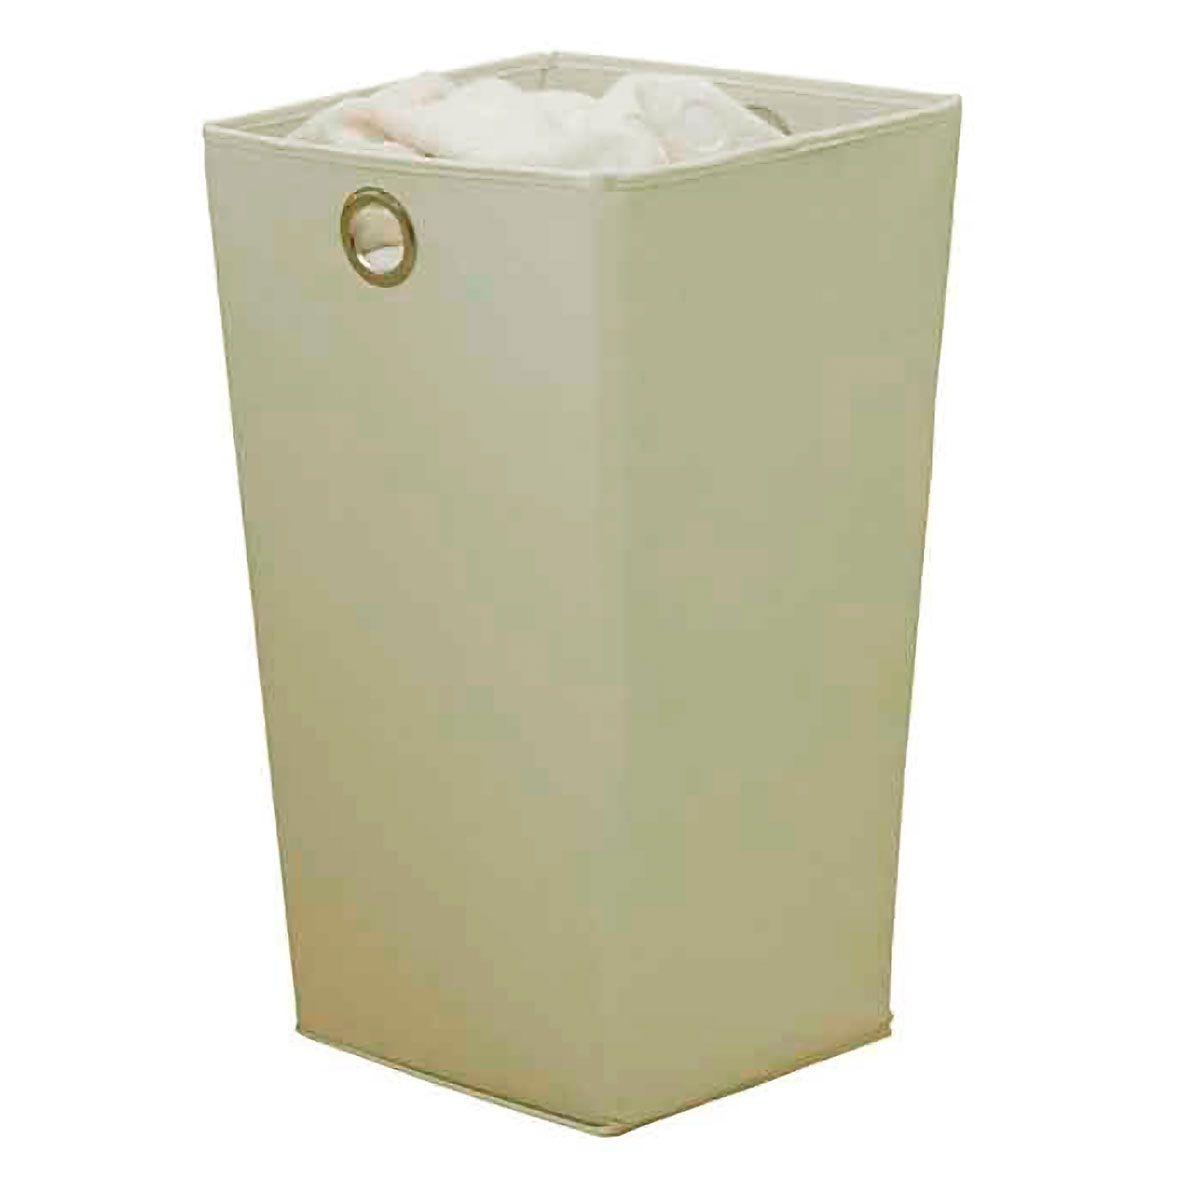 Cesto de Roupas Impermeável 60 litros Bege